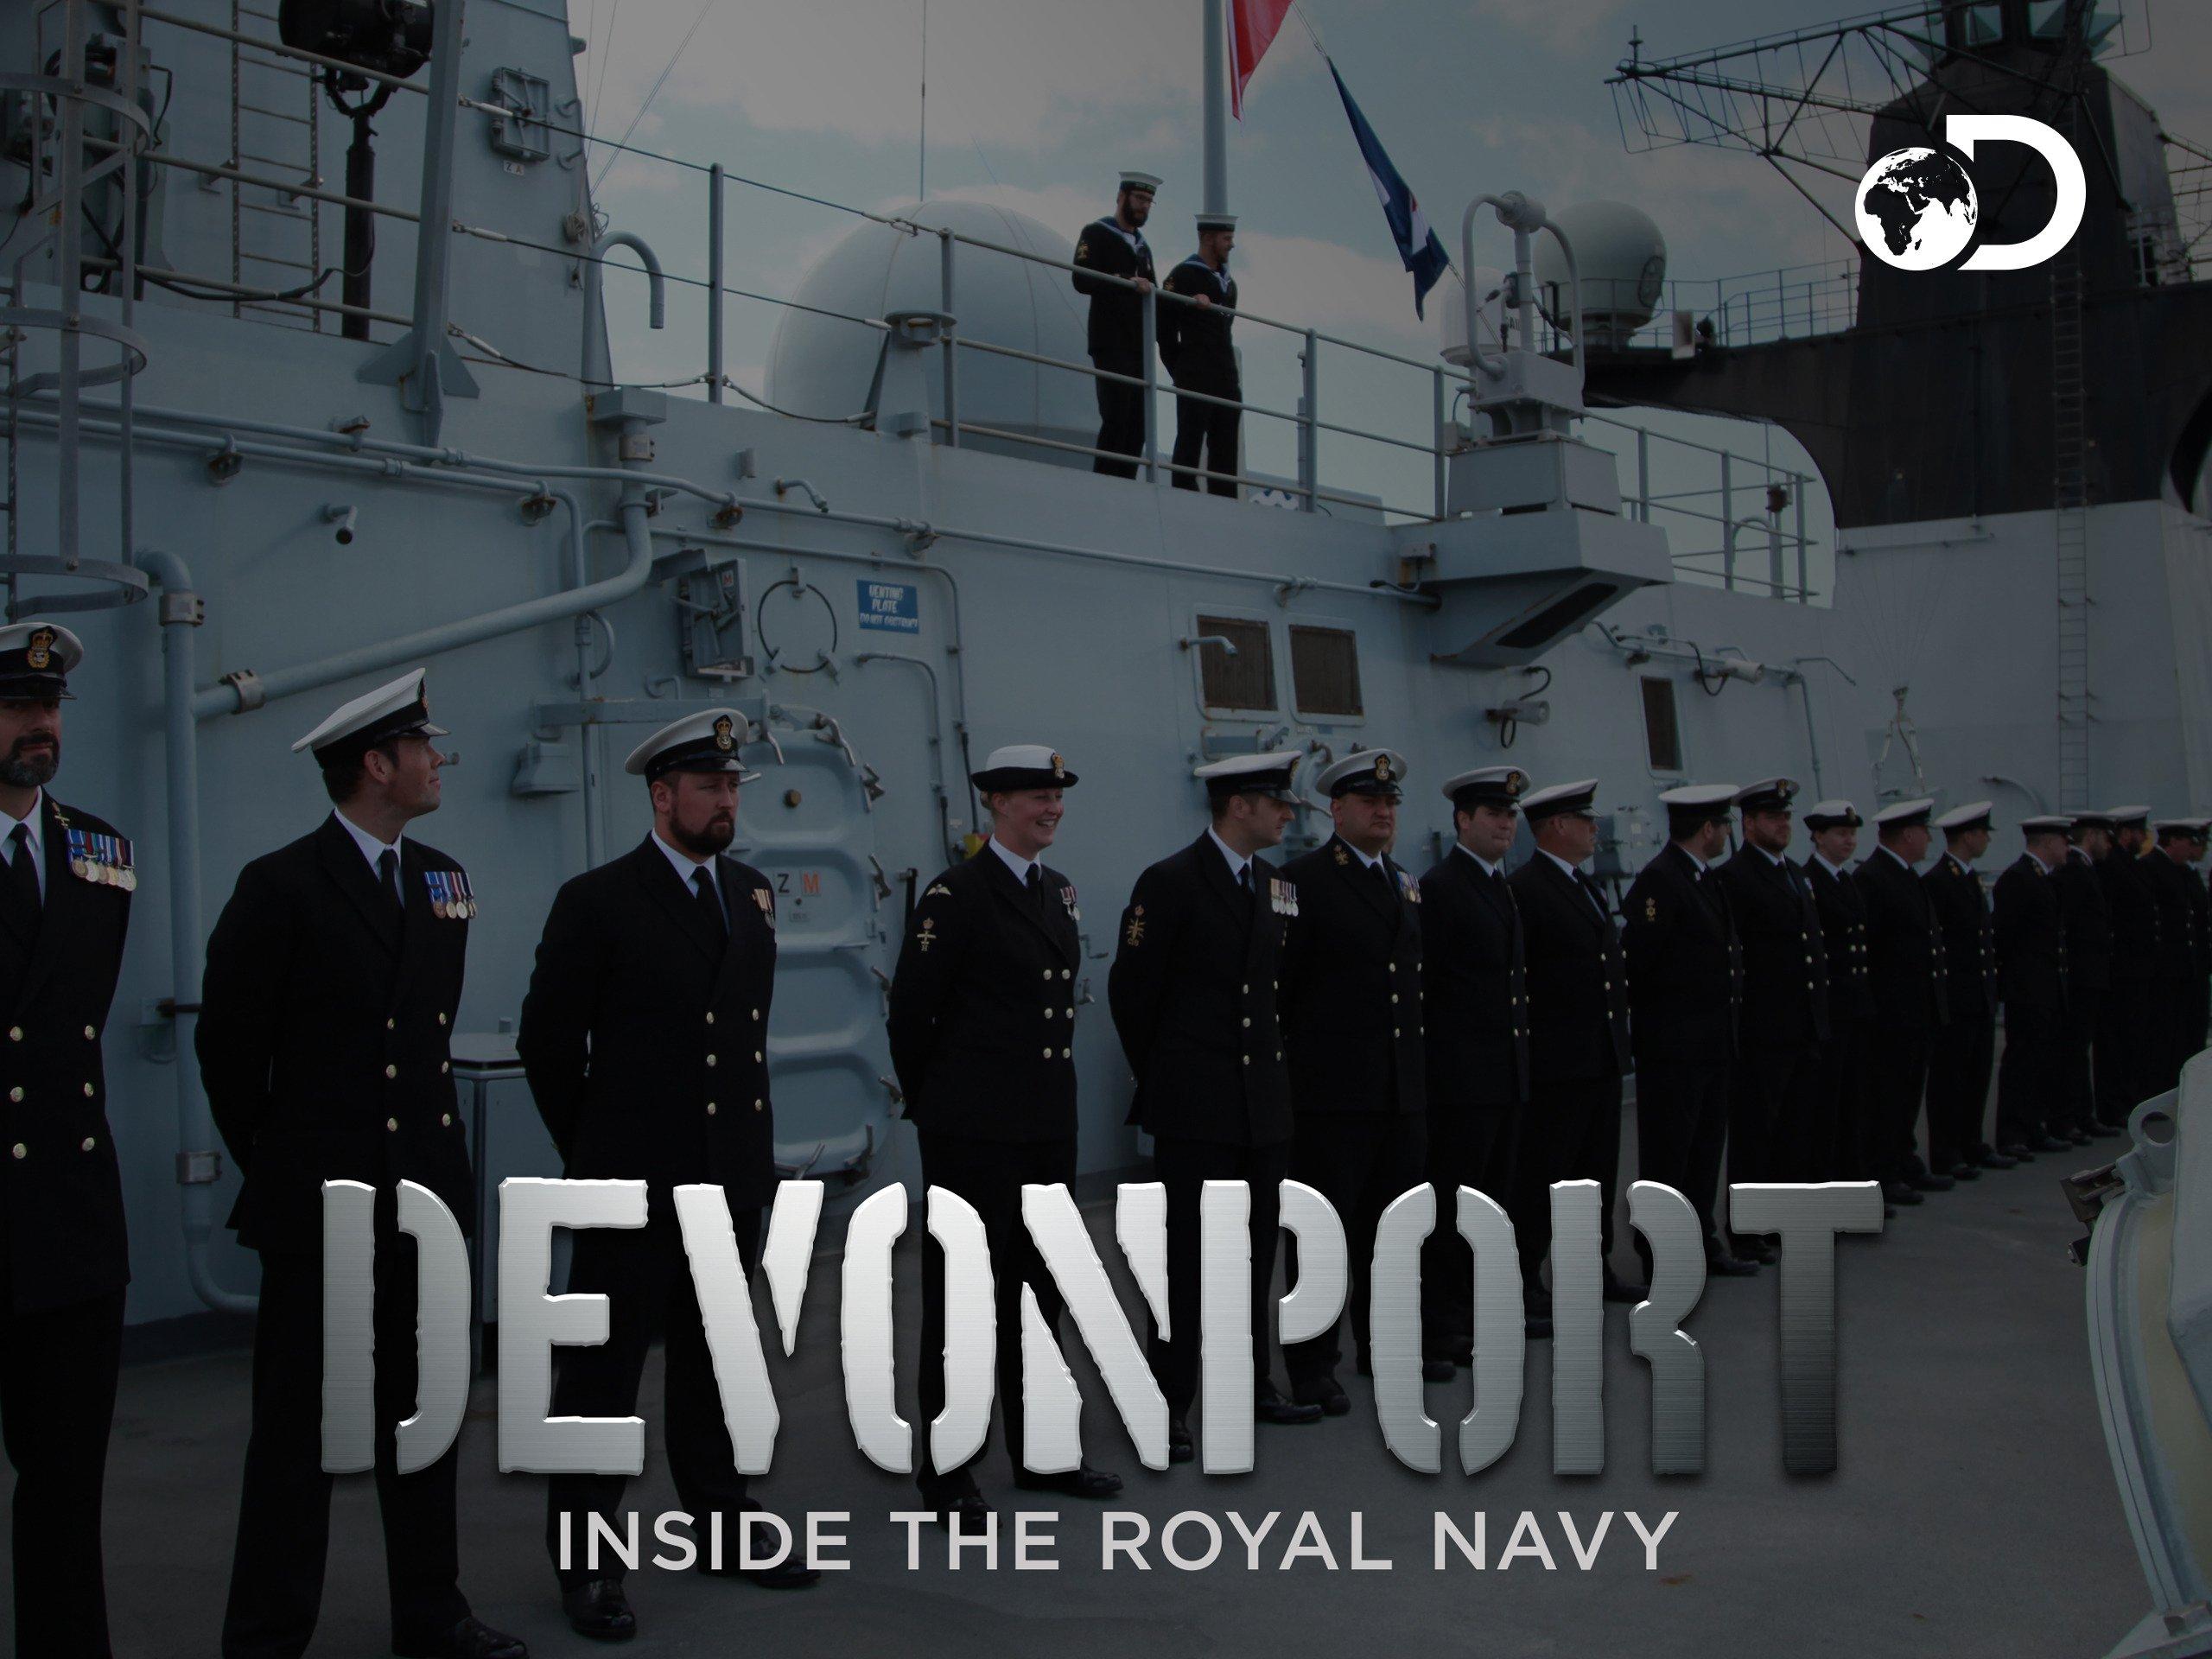 Amazon co uk: Watch Devonport: Inside The Royal Navy - Season 1